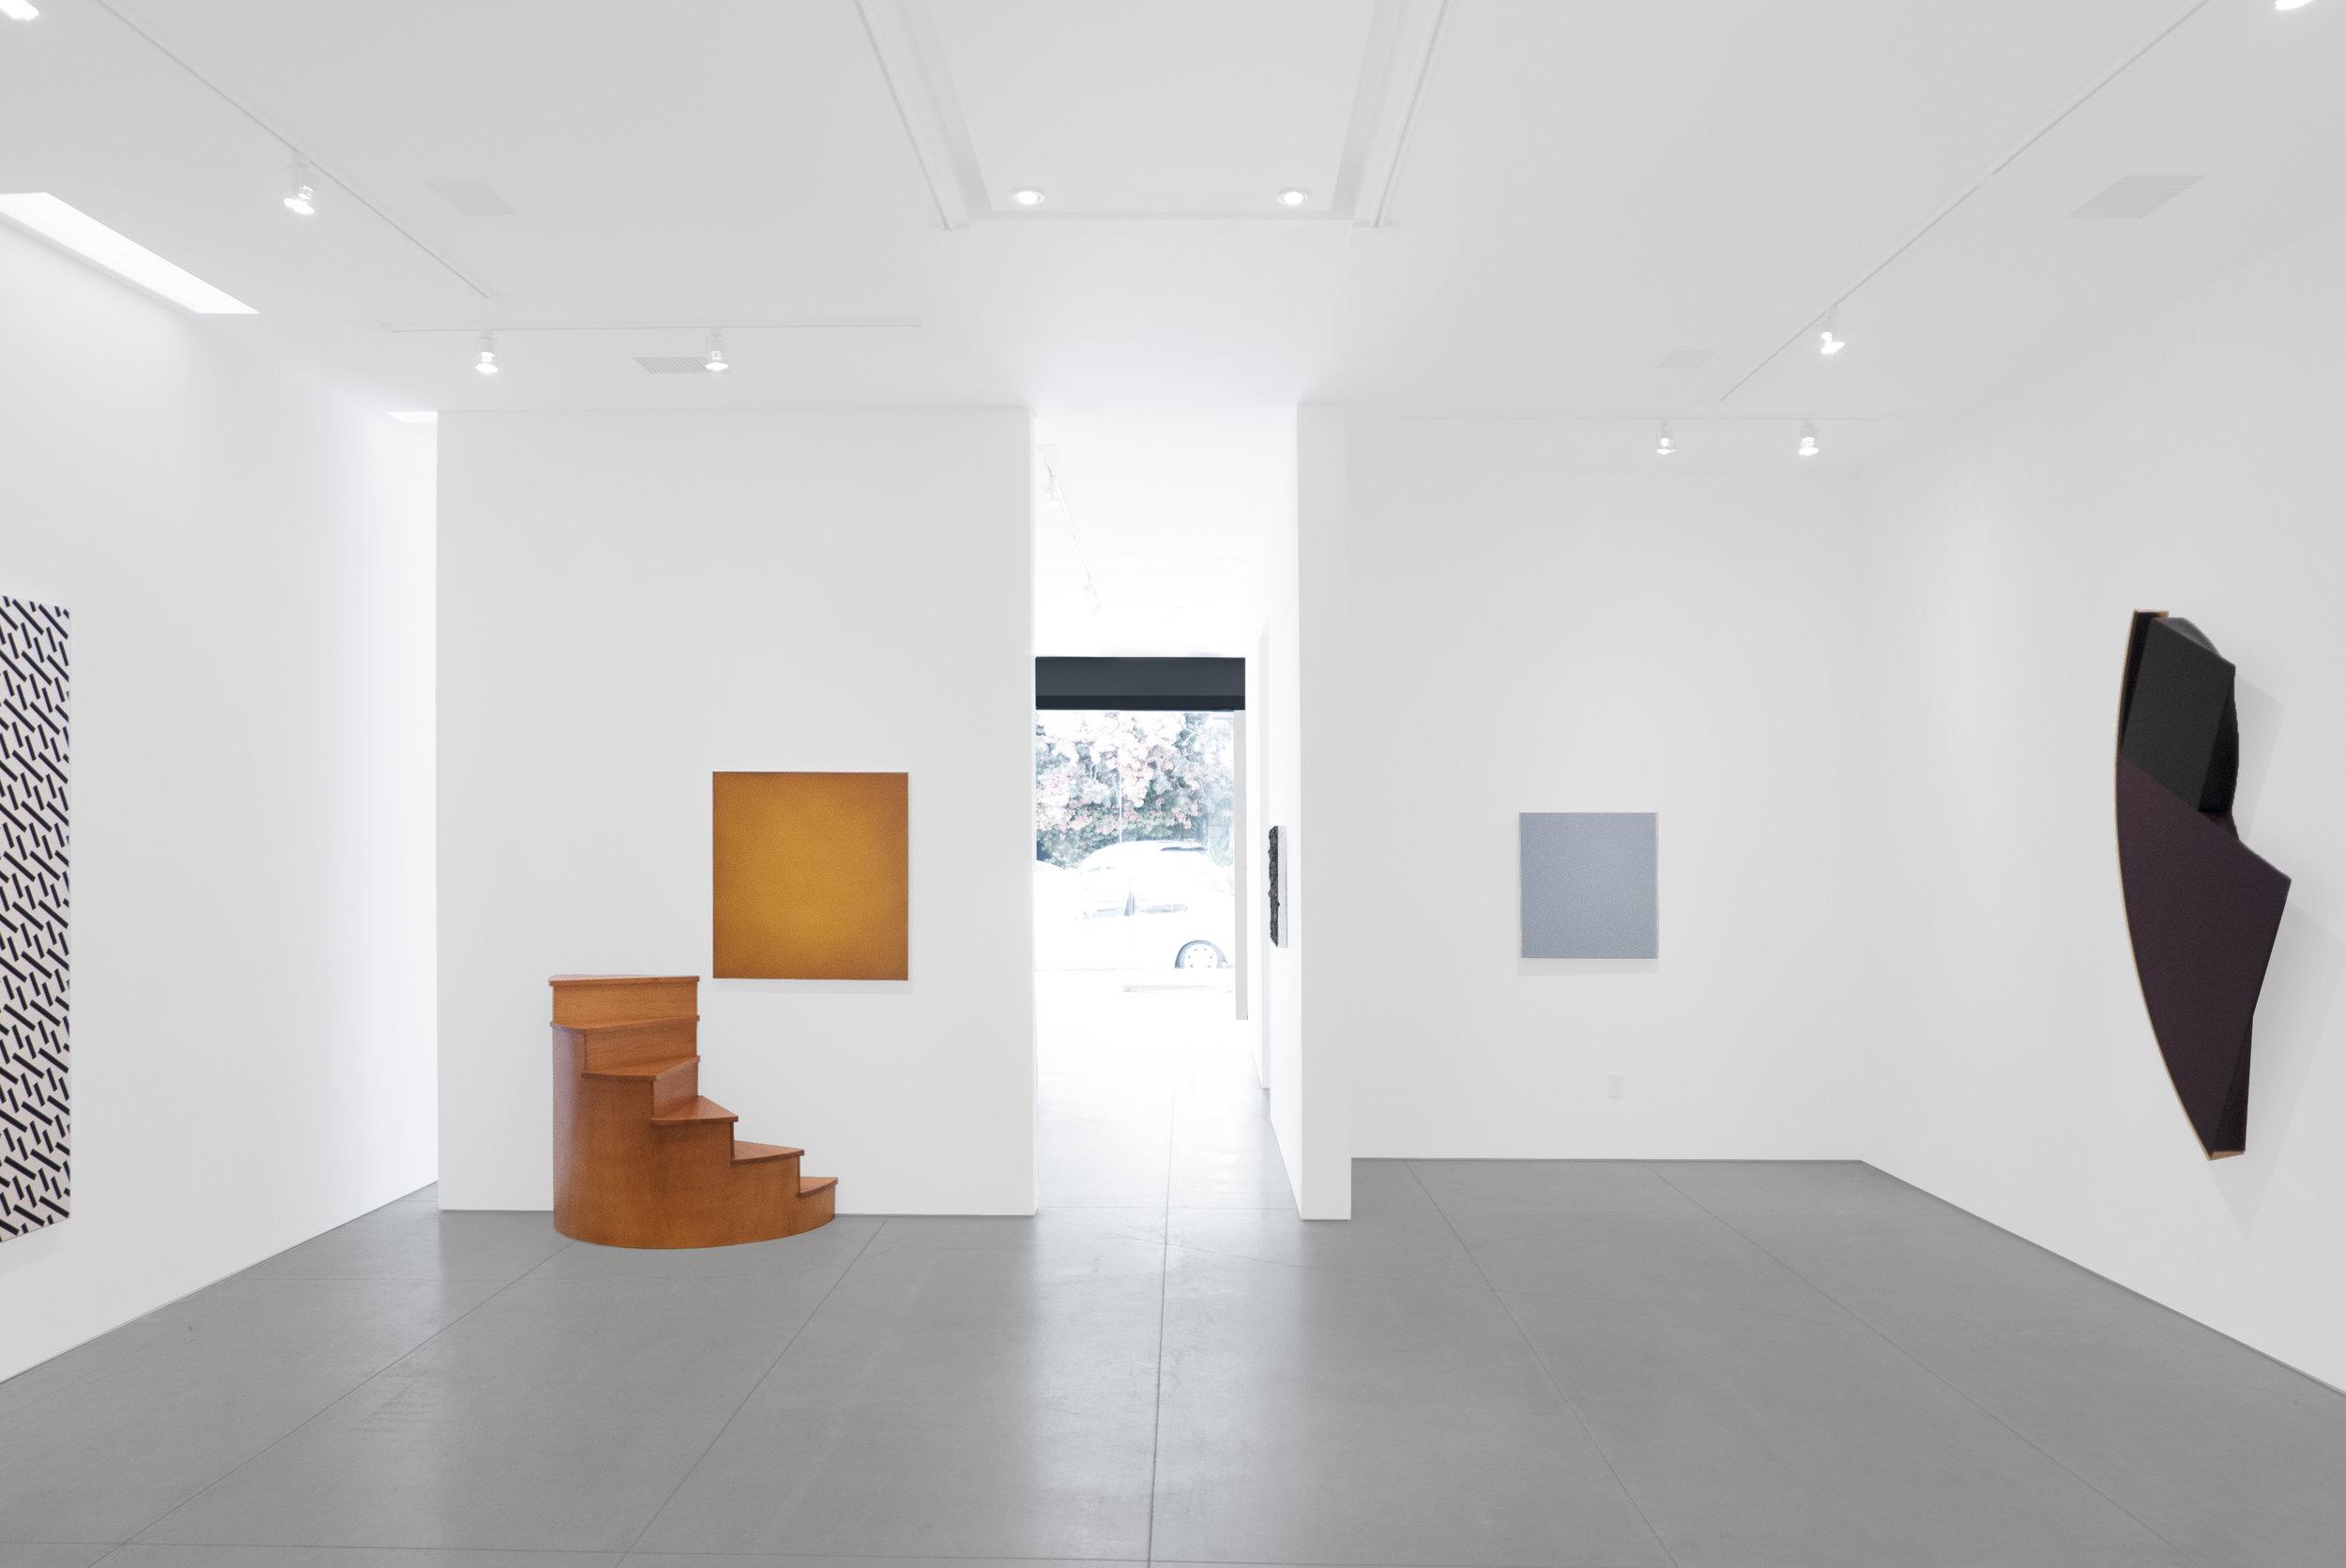 25 Years_Peter Blake Gallery_2019_Installation View_33.jpg